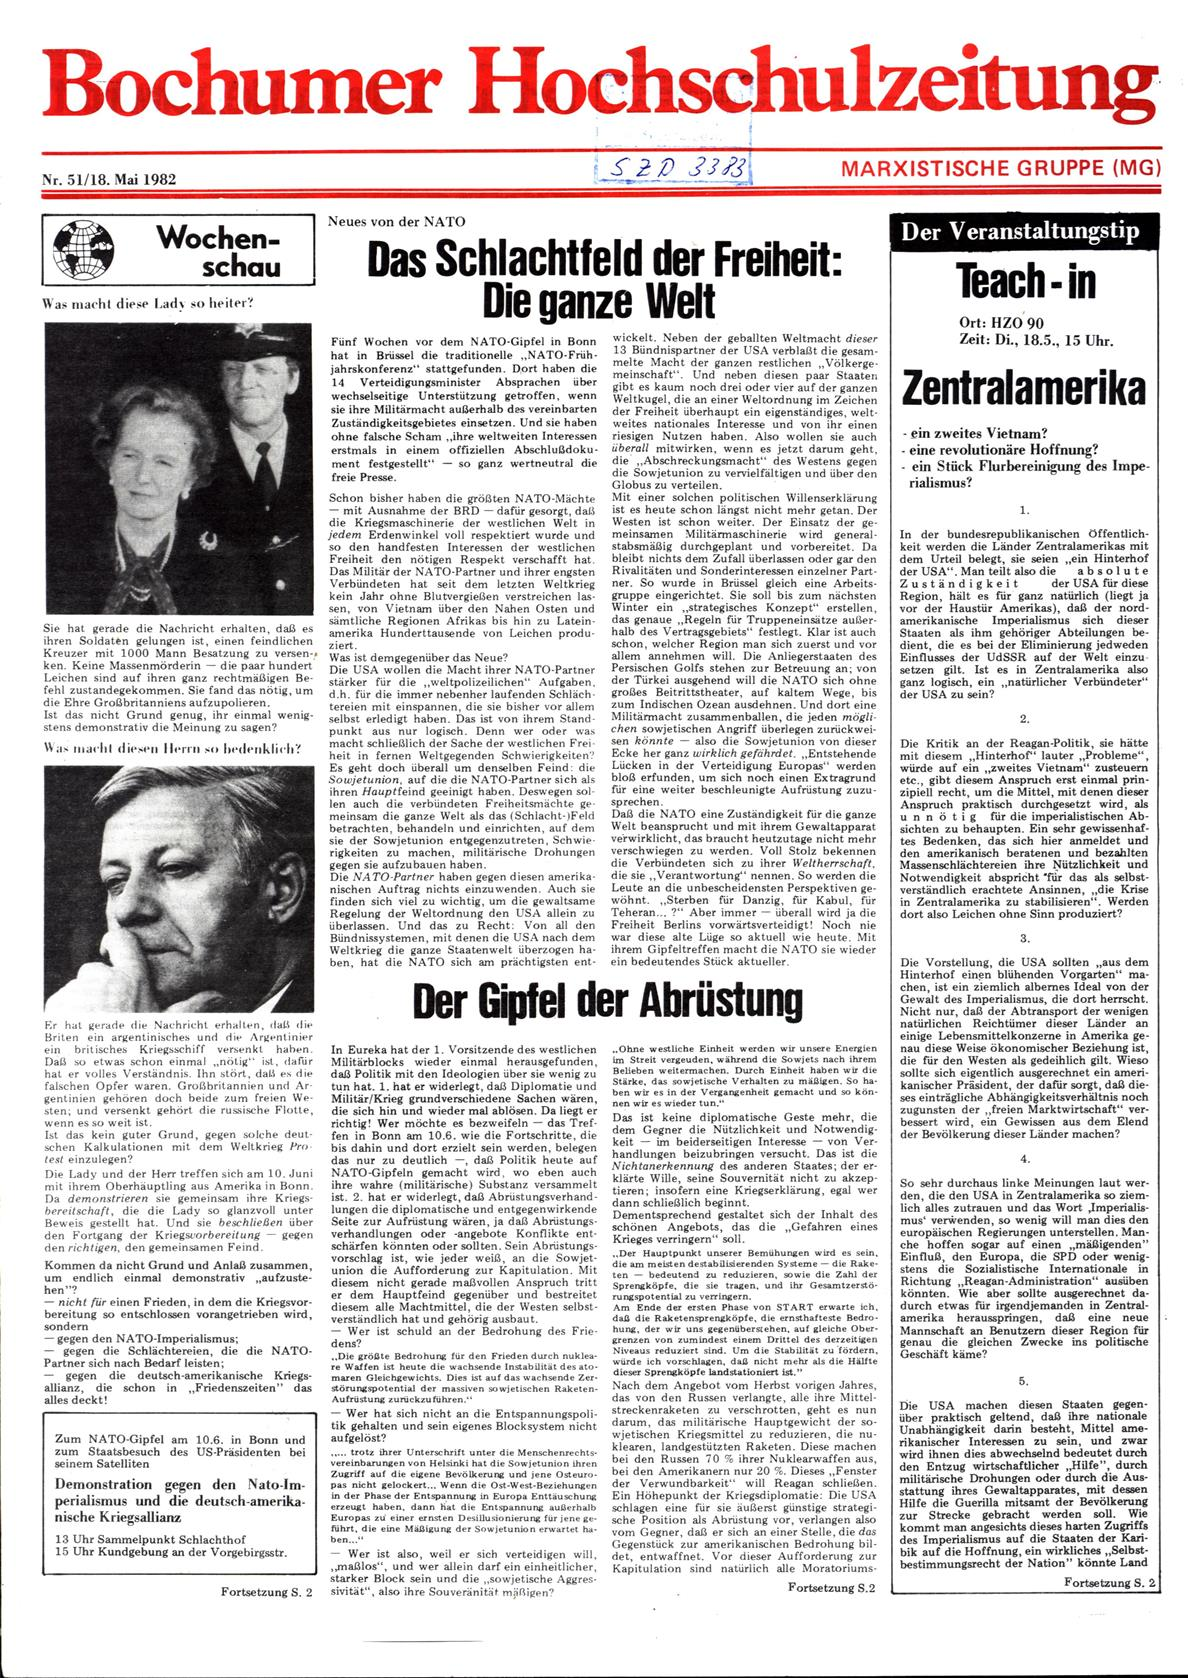 Bochum_BHZ_19820518_051_001